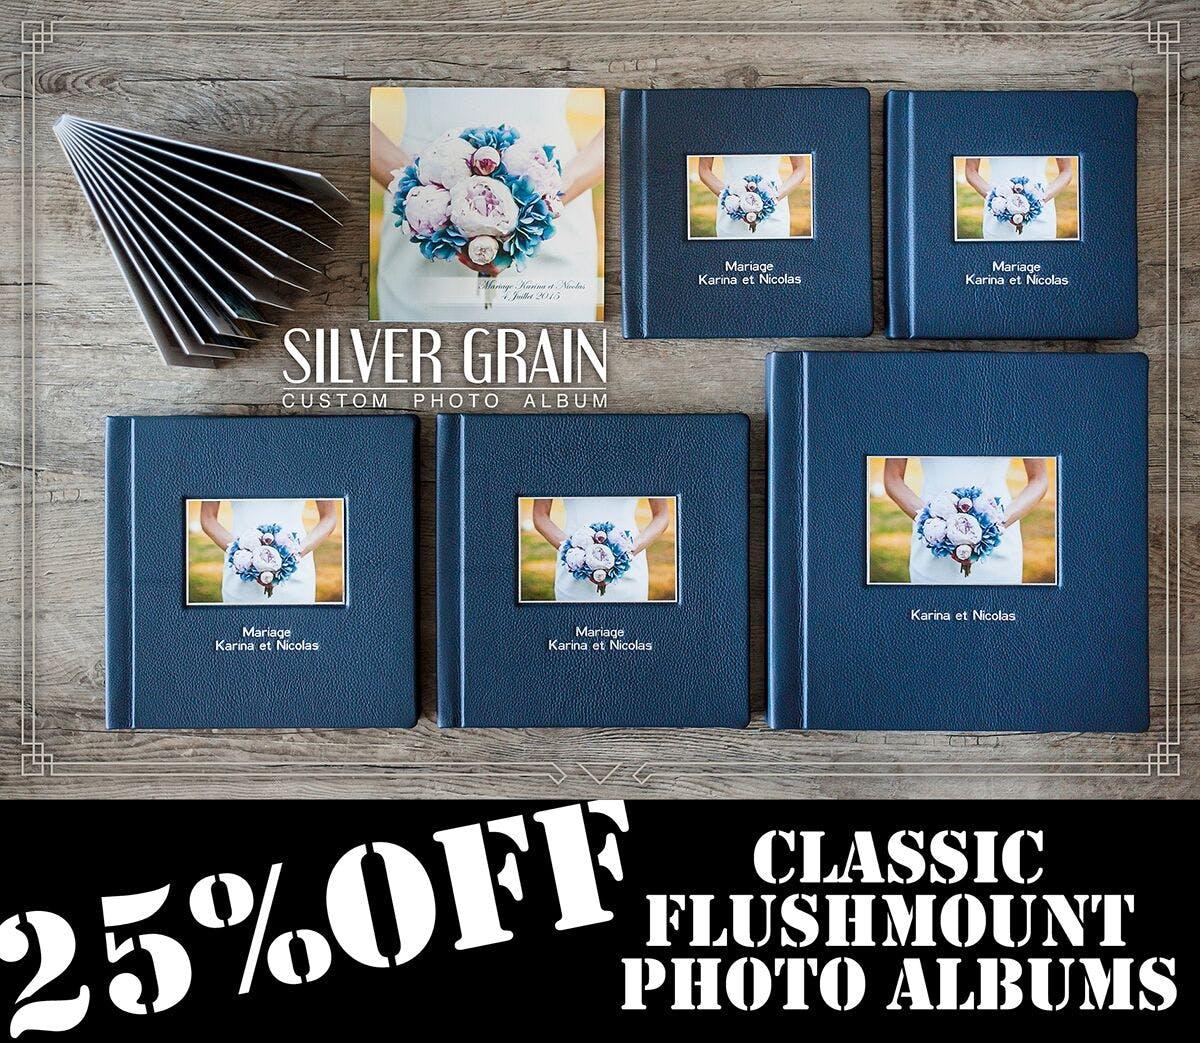 Silver Grain Custom Photo Albums Black Friday discount